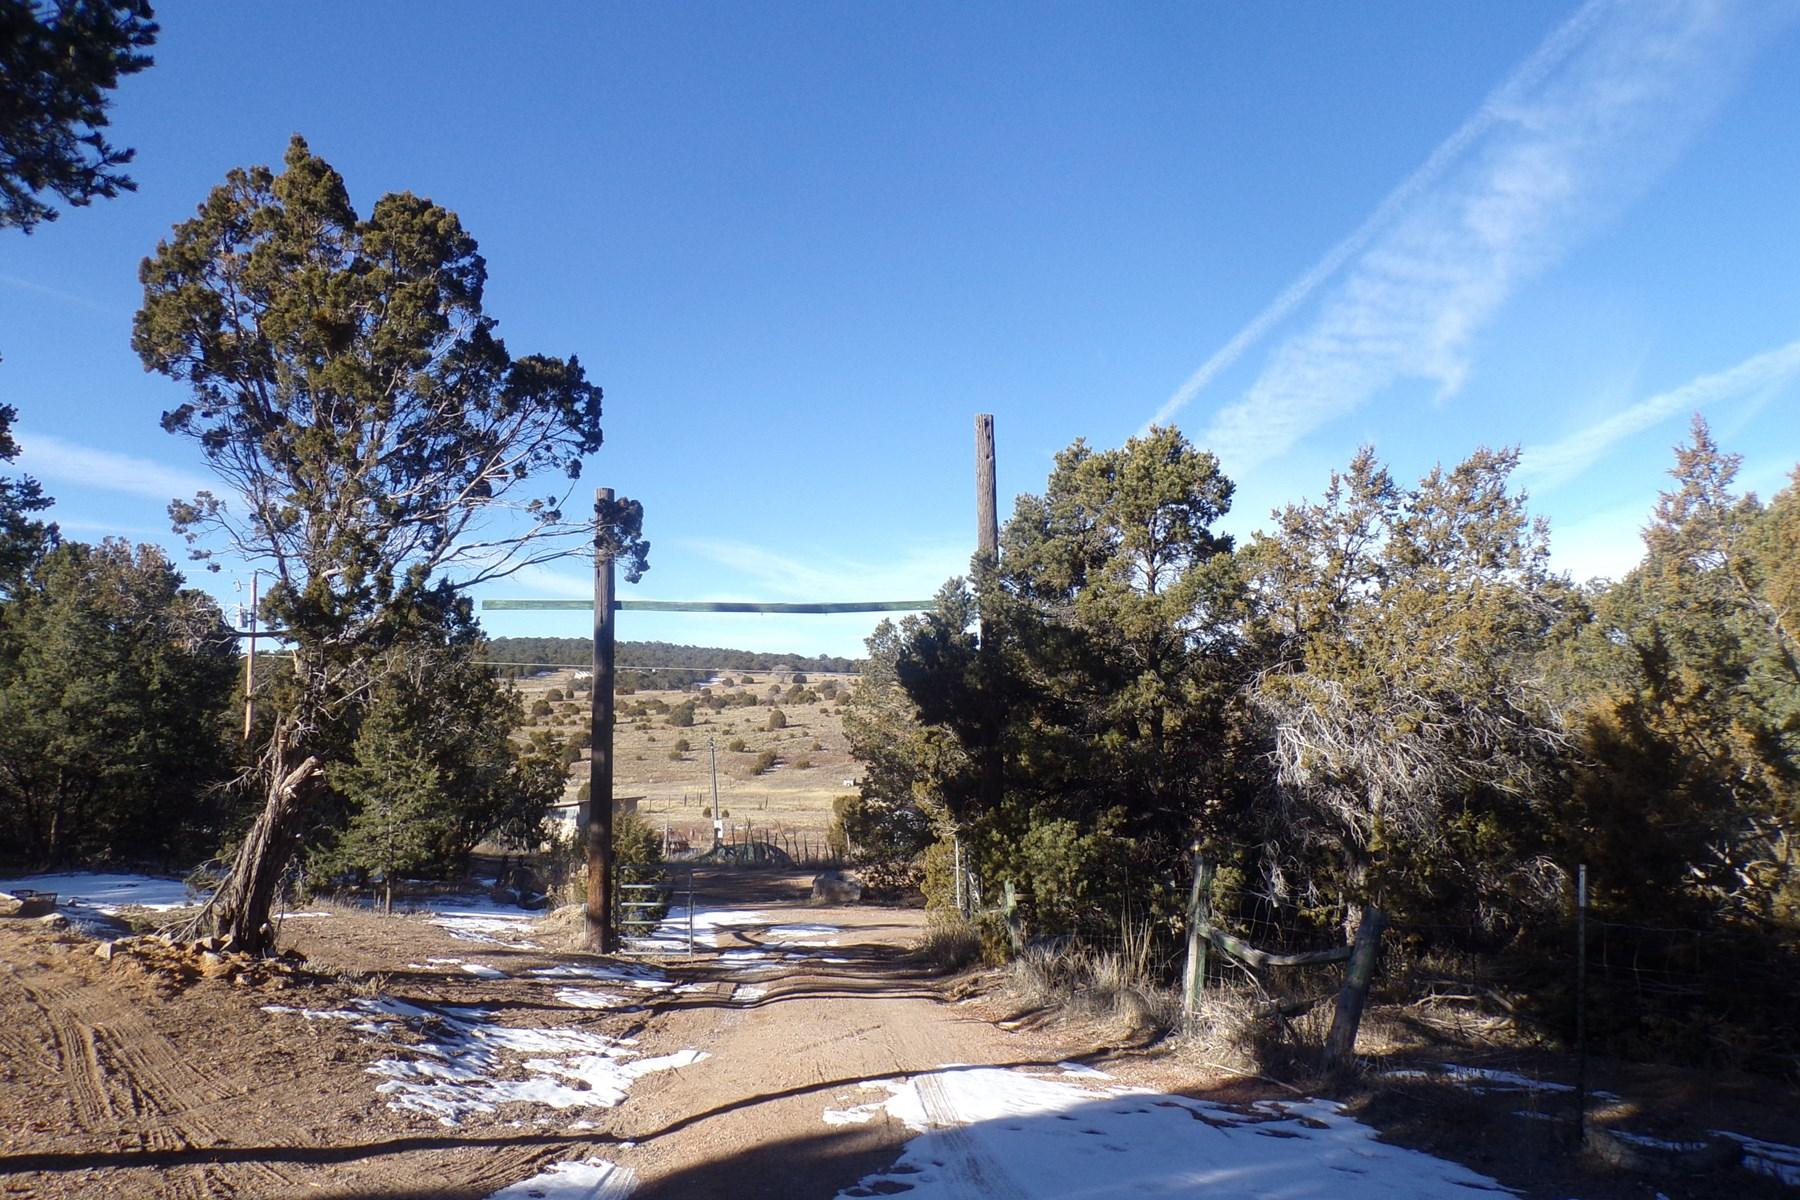 Santa Fe County New Mexico Fixer Upper For Sale